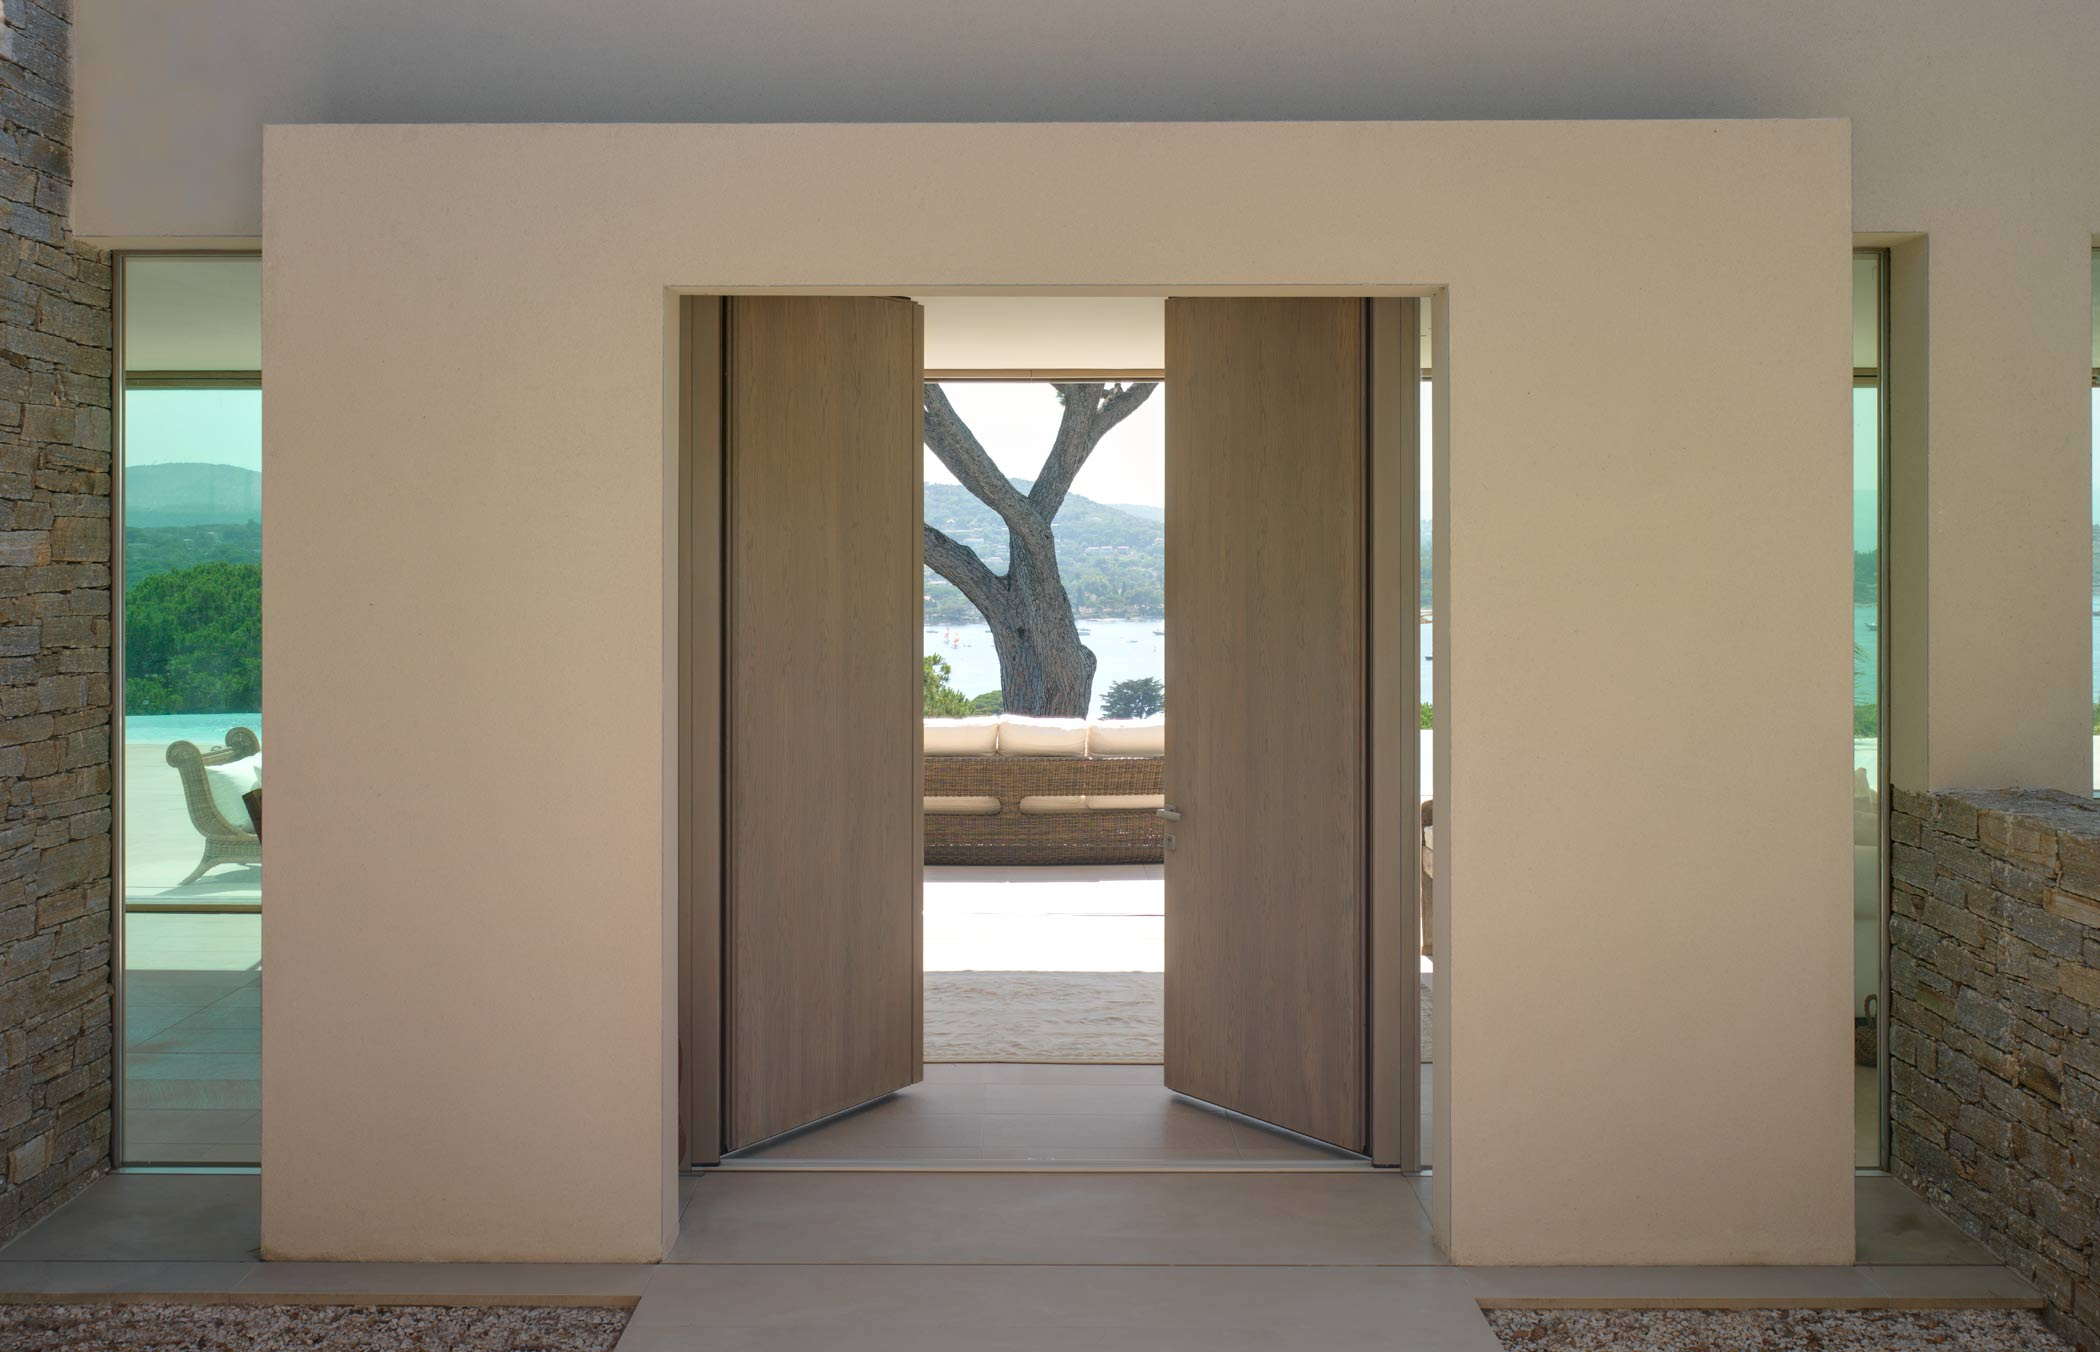 External view of a Saint Tropez model door in smooth wood